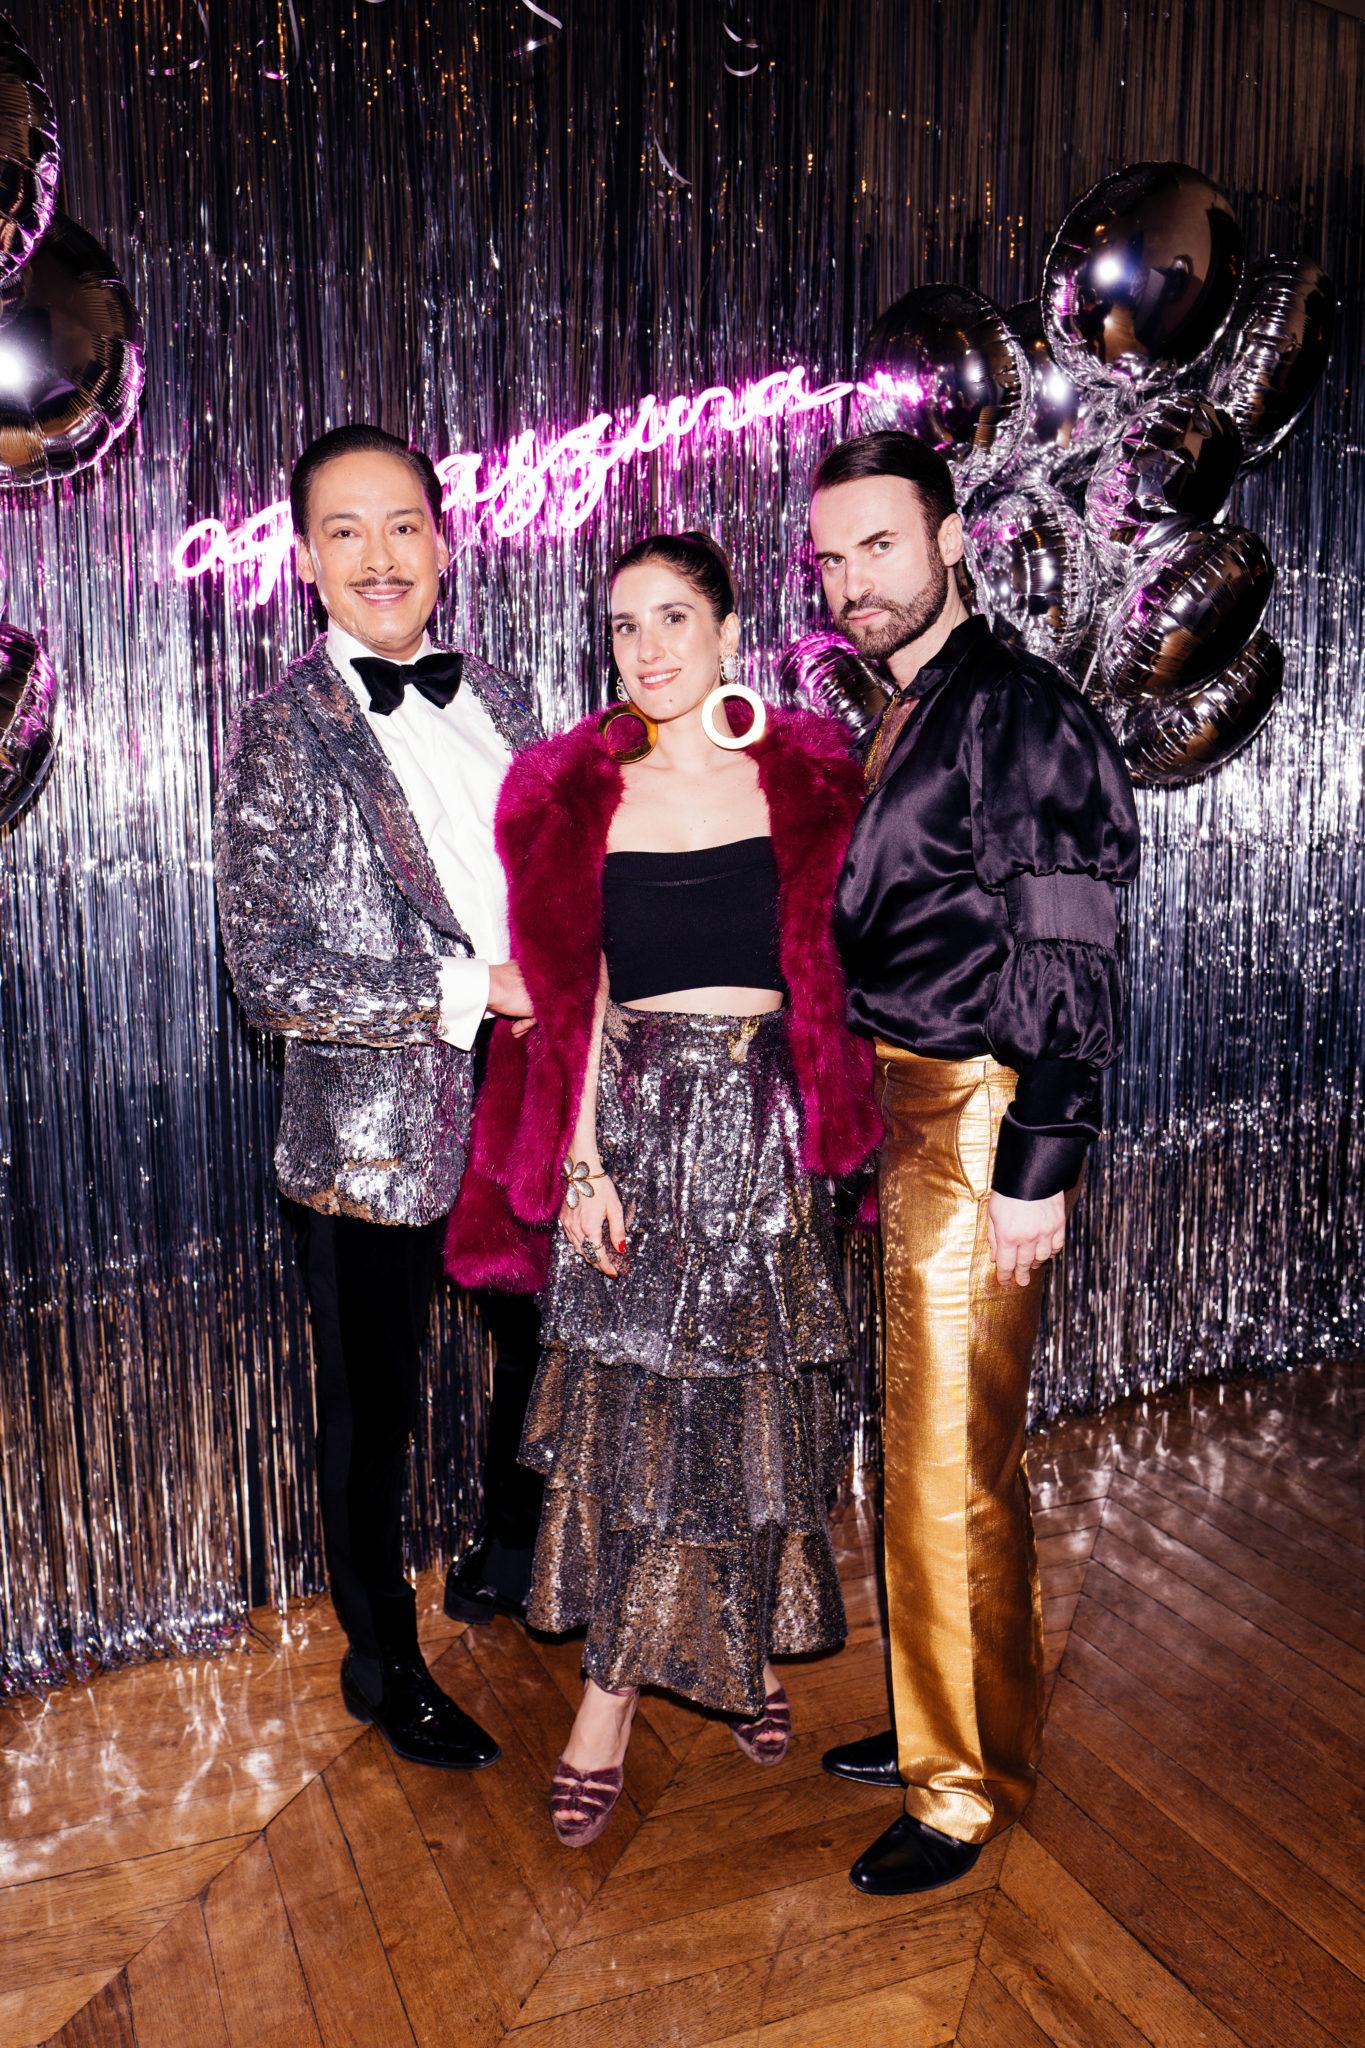 AQUAZZURA Hosts Disco Themed Party In Paris To Celebrate